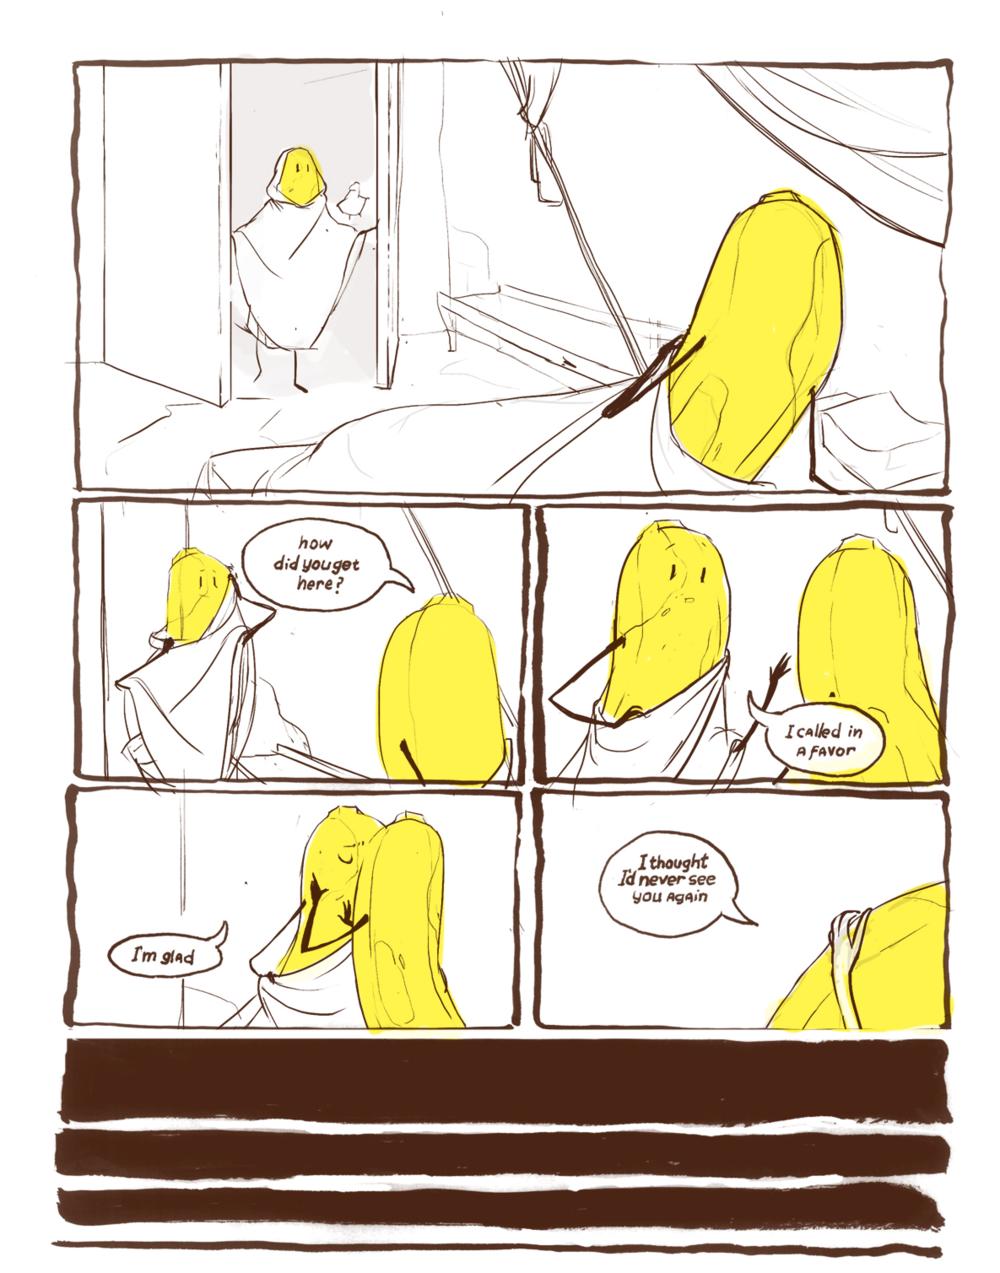 bananaMini_03.png